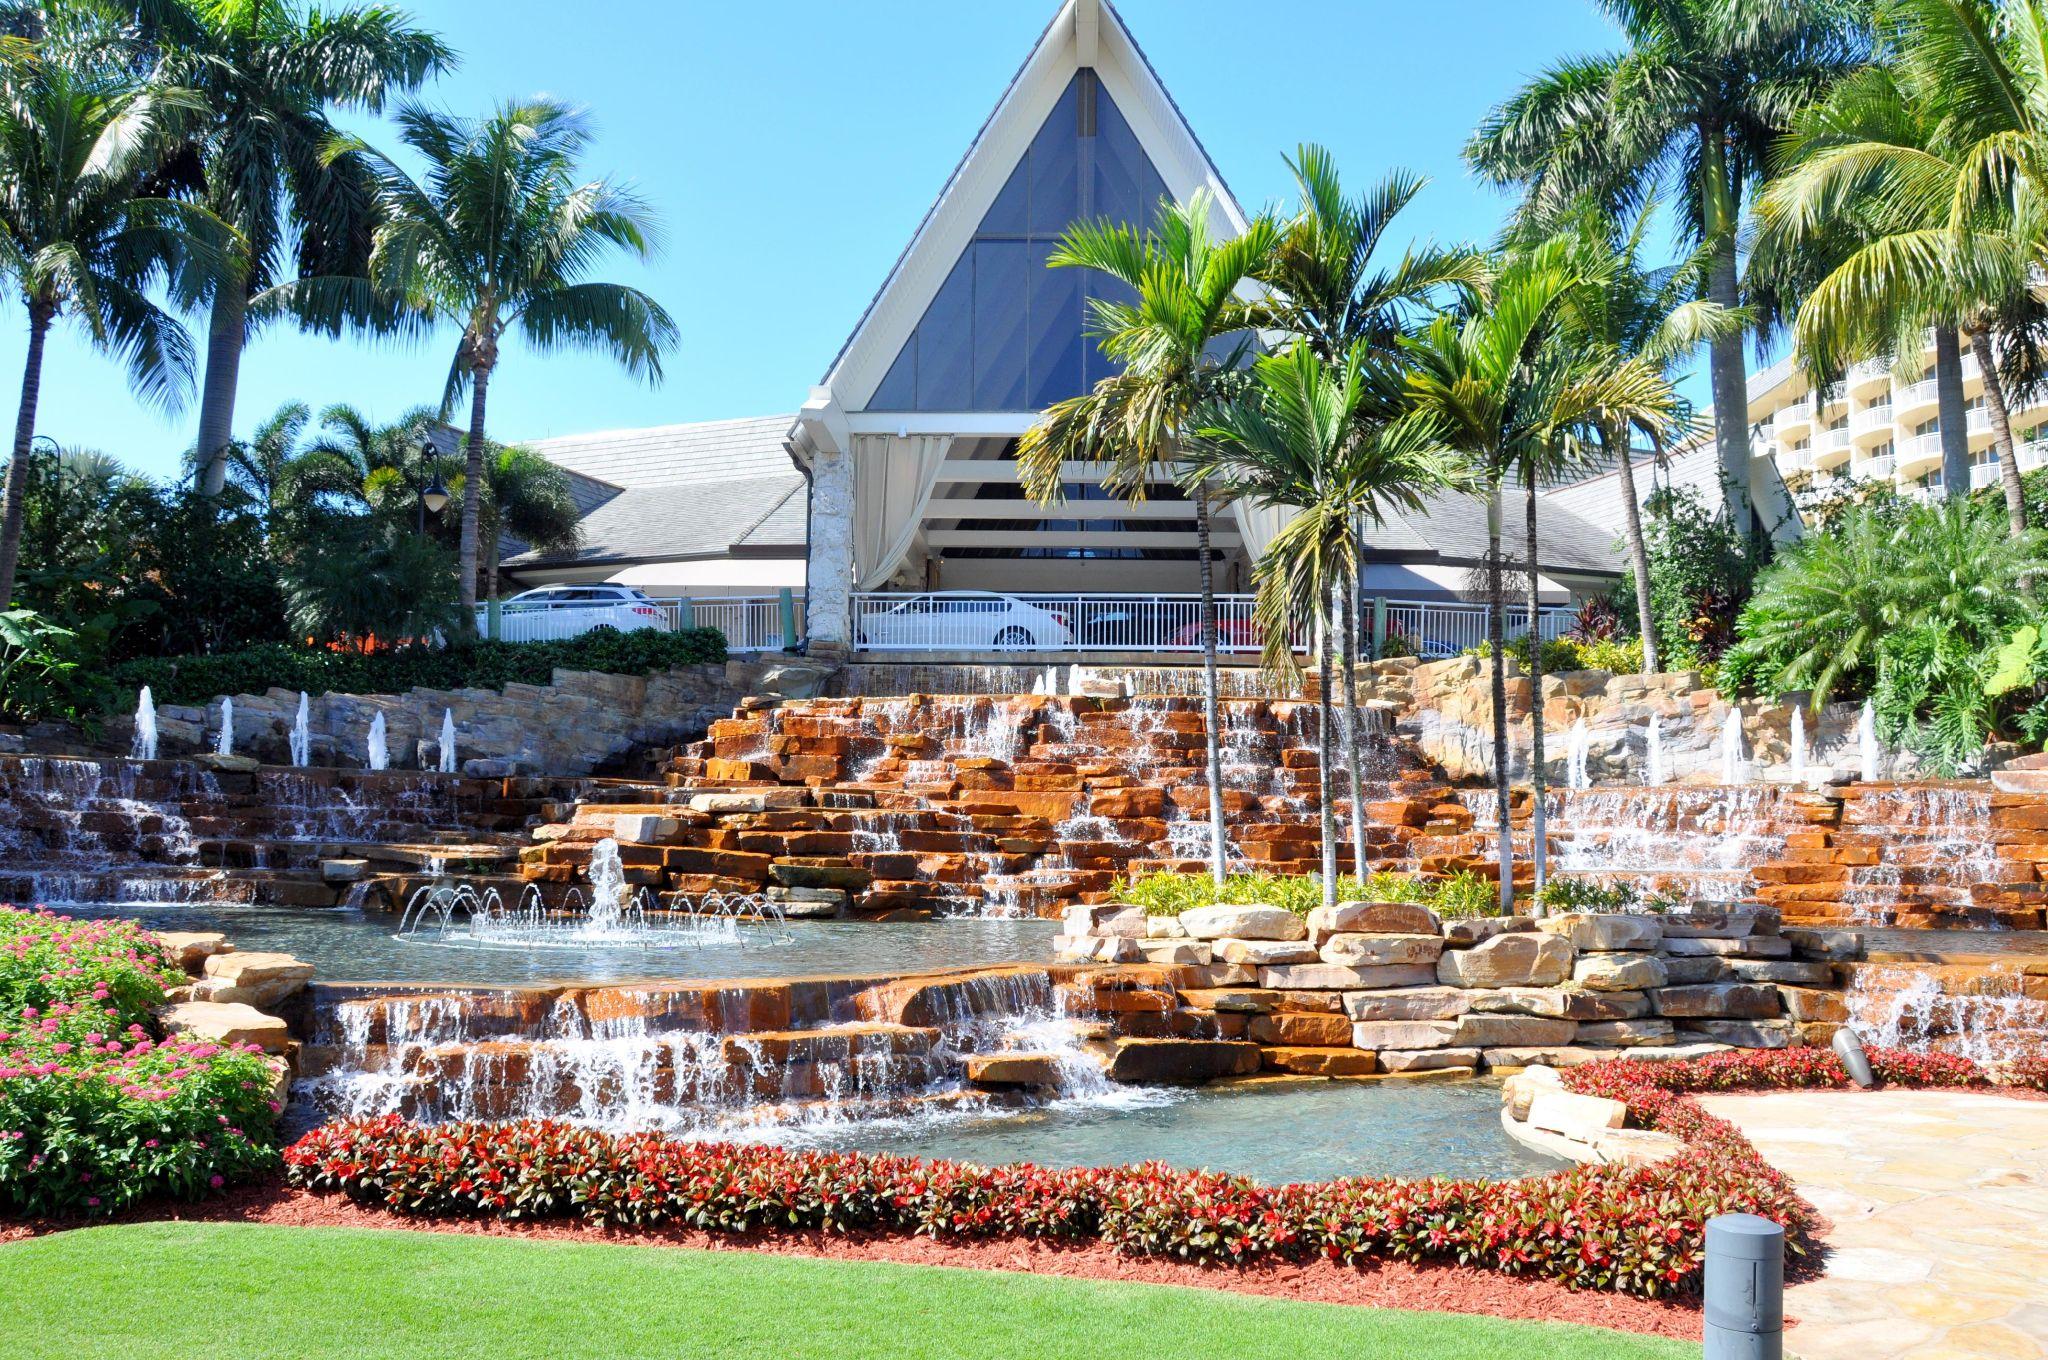 JW Marriott Marco Island, FL